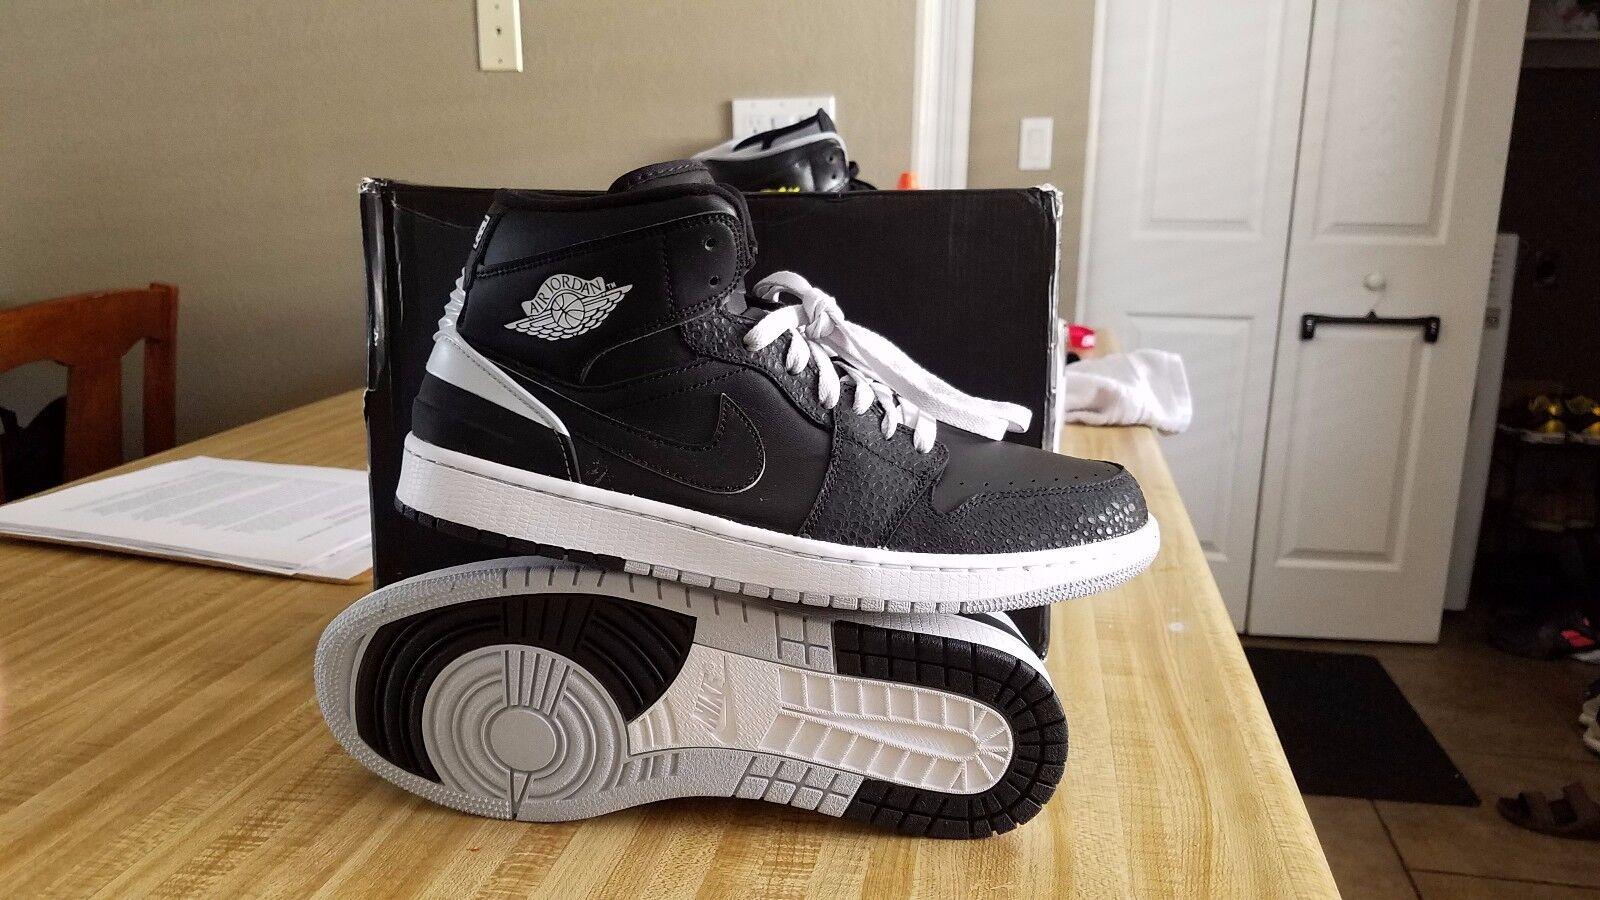 New Nike Air Jordan 1 Retro '86 Basketball shoes Black White Platinum  644490-010